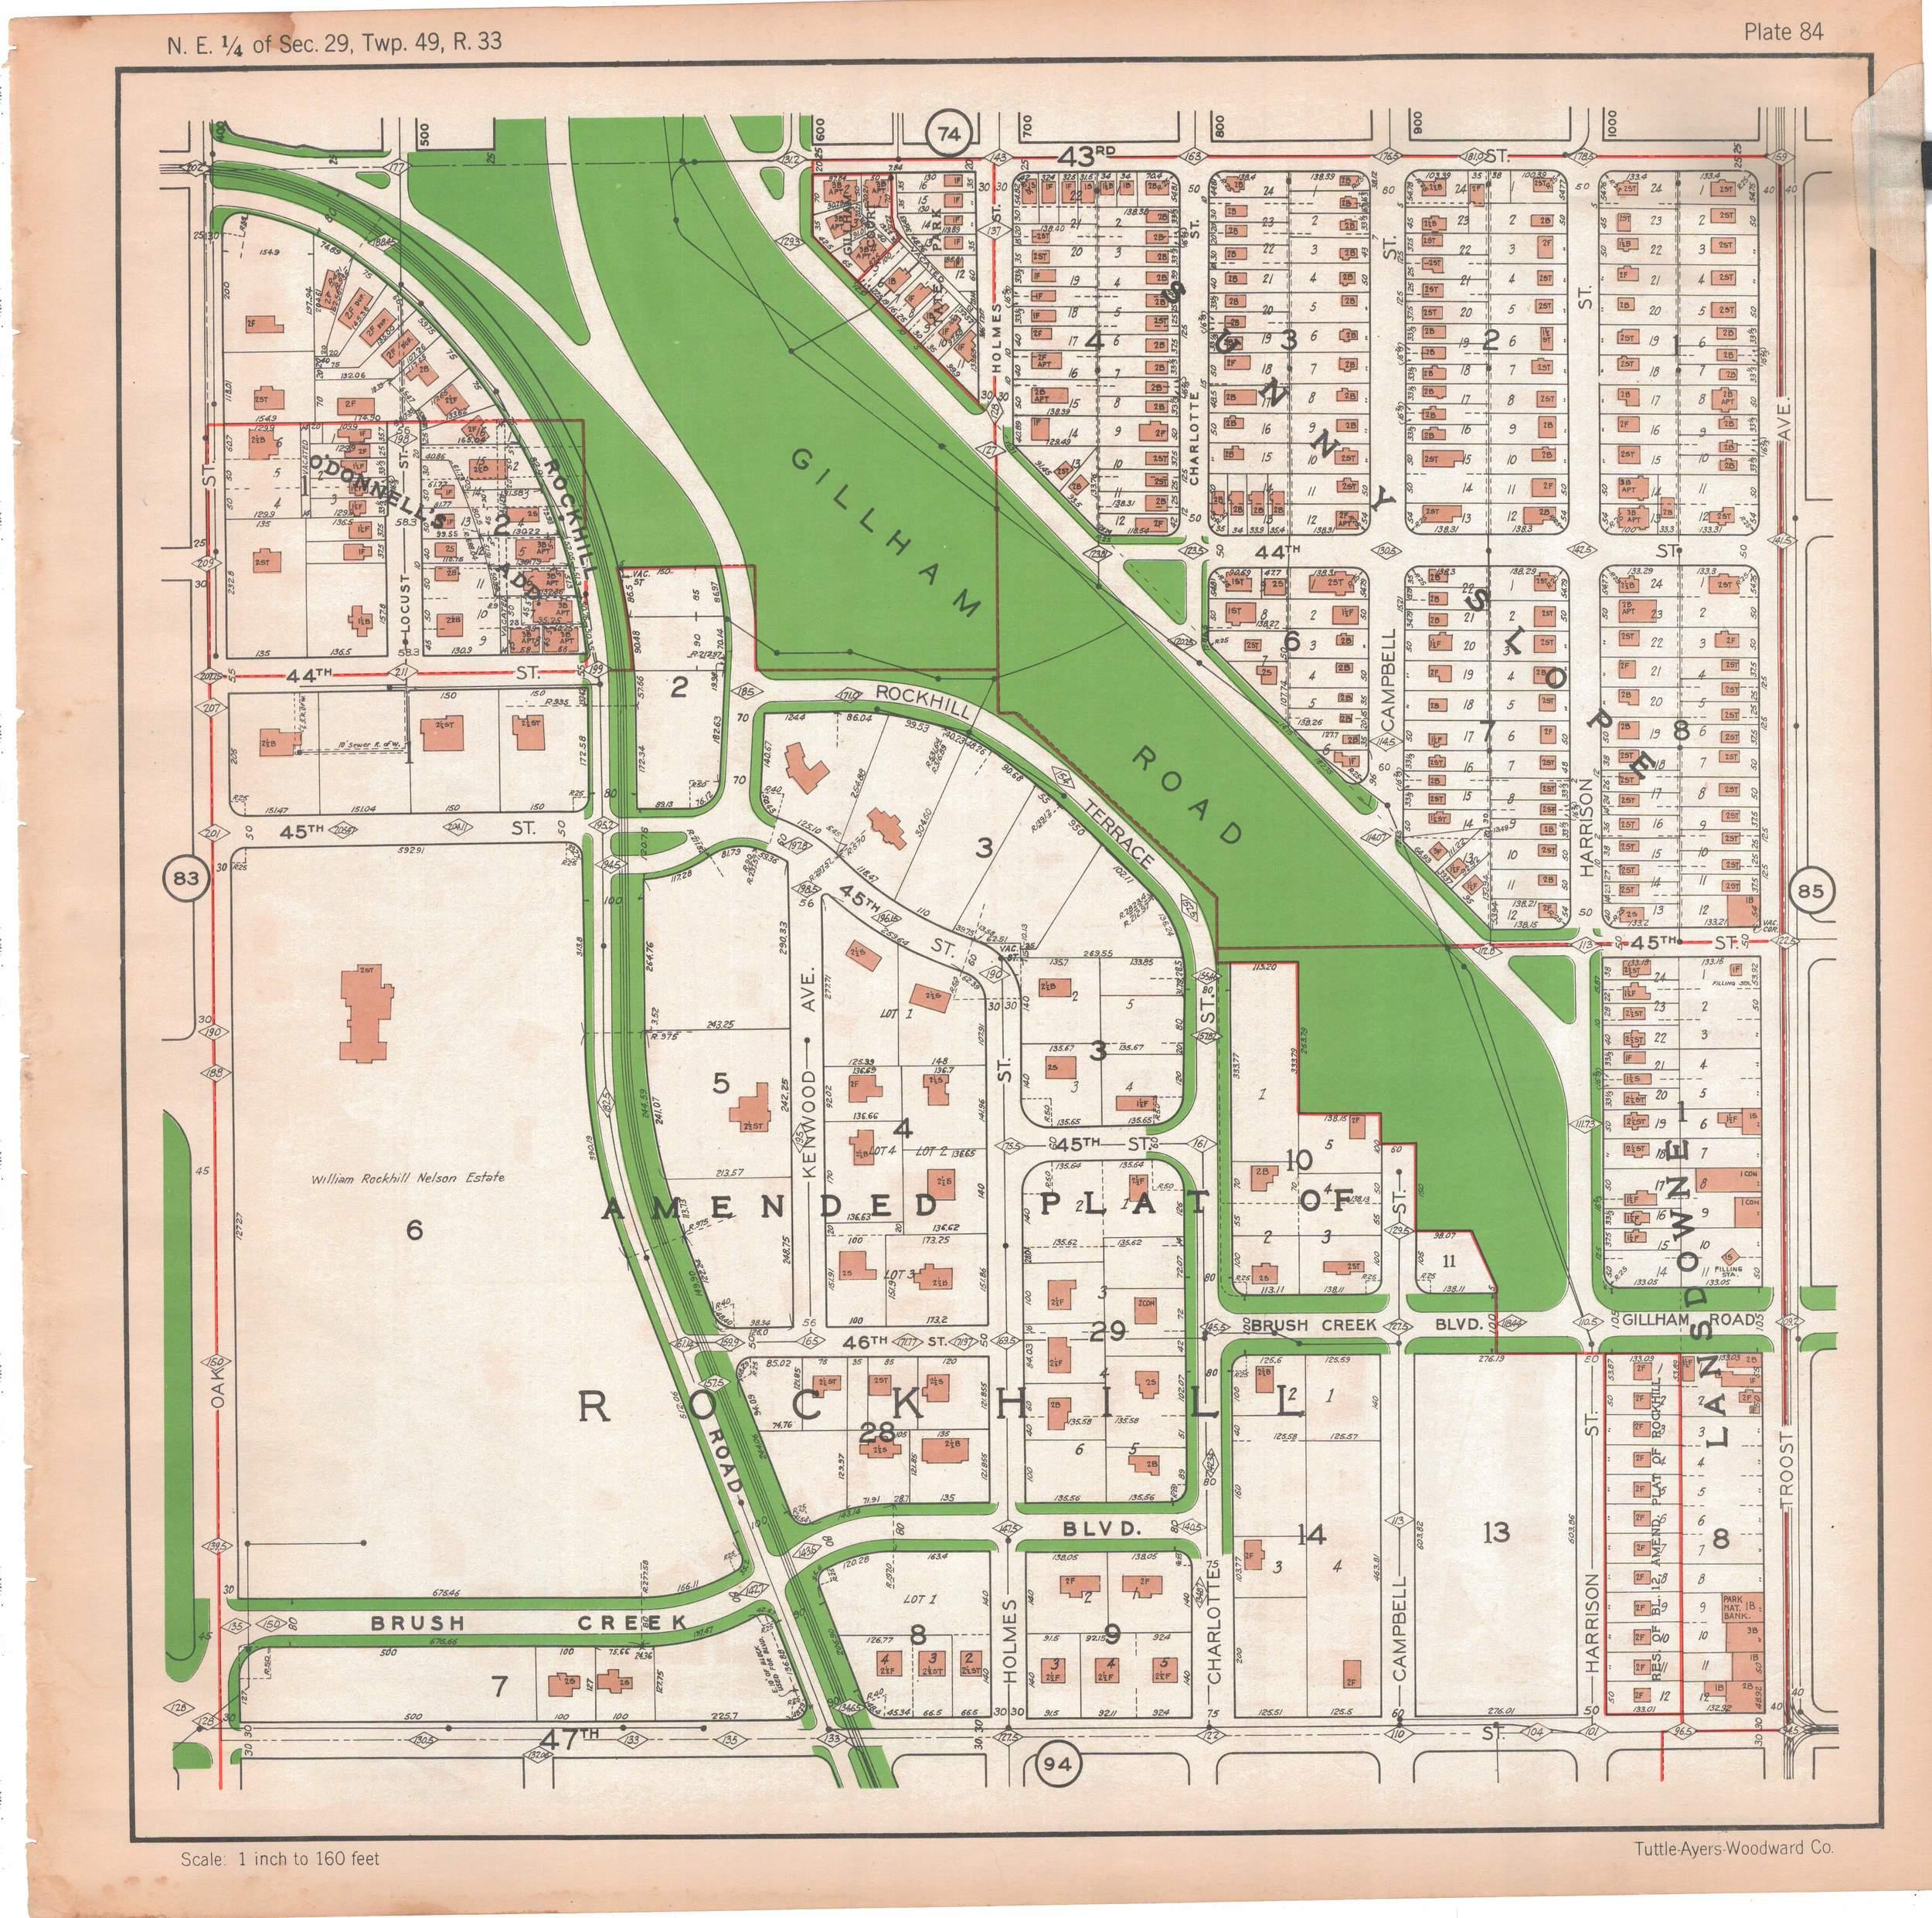 1925 TUTTLE_AYERS_Plate 84.JPG